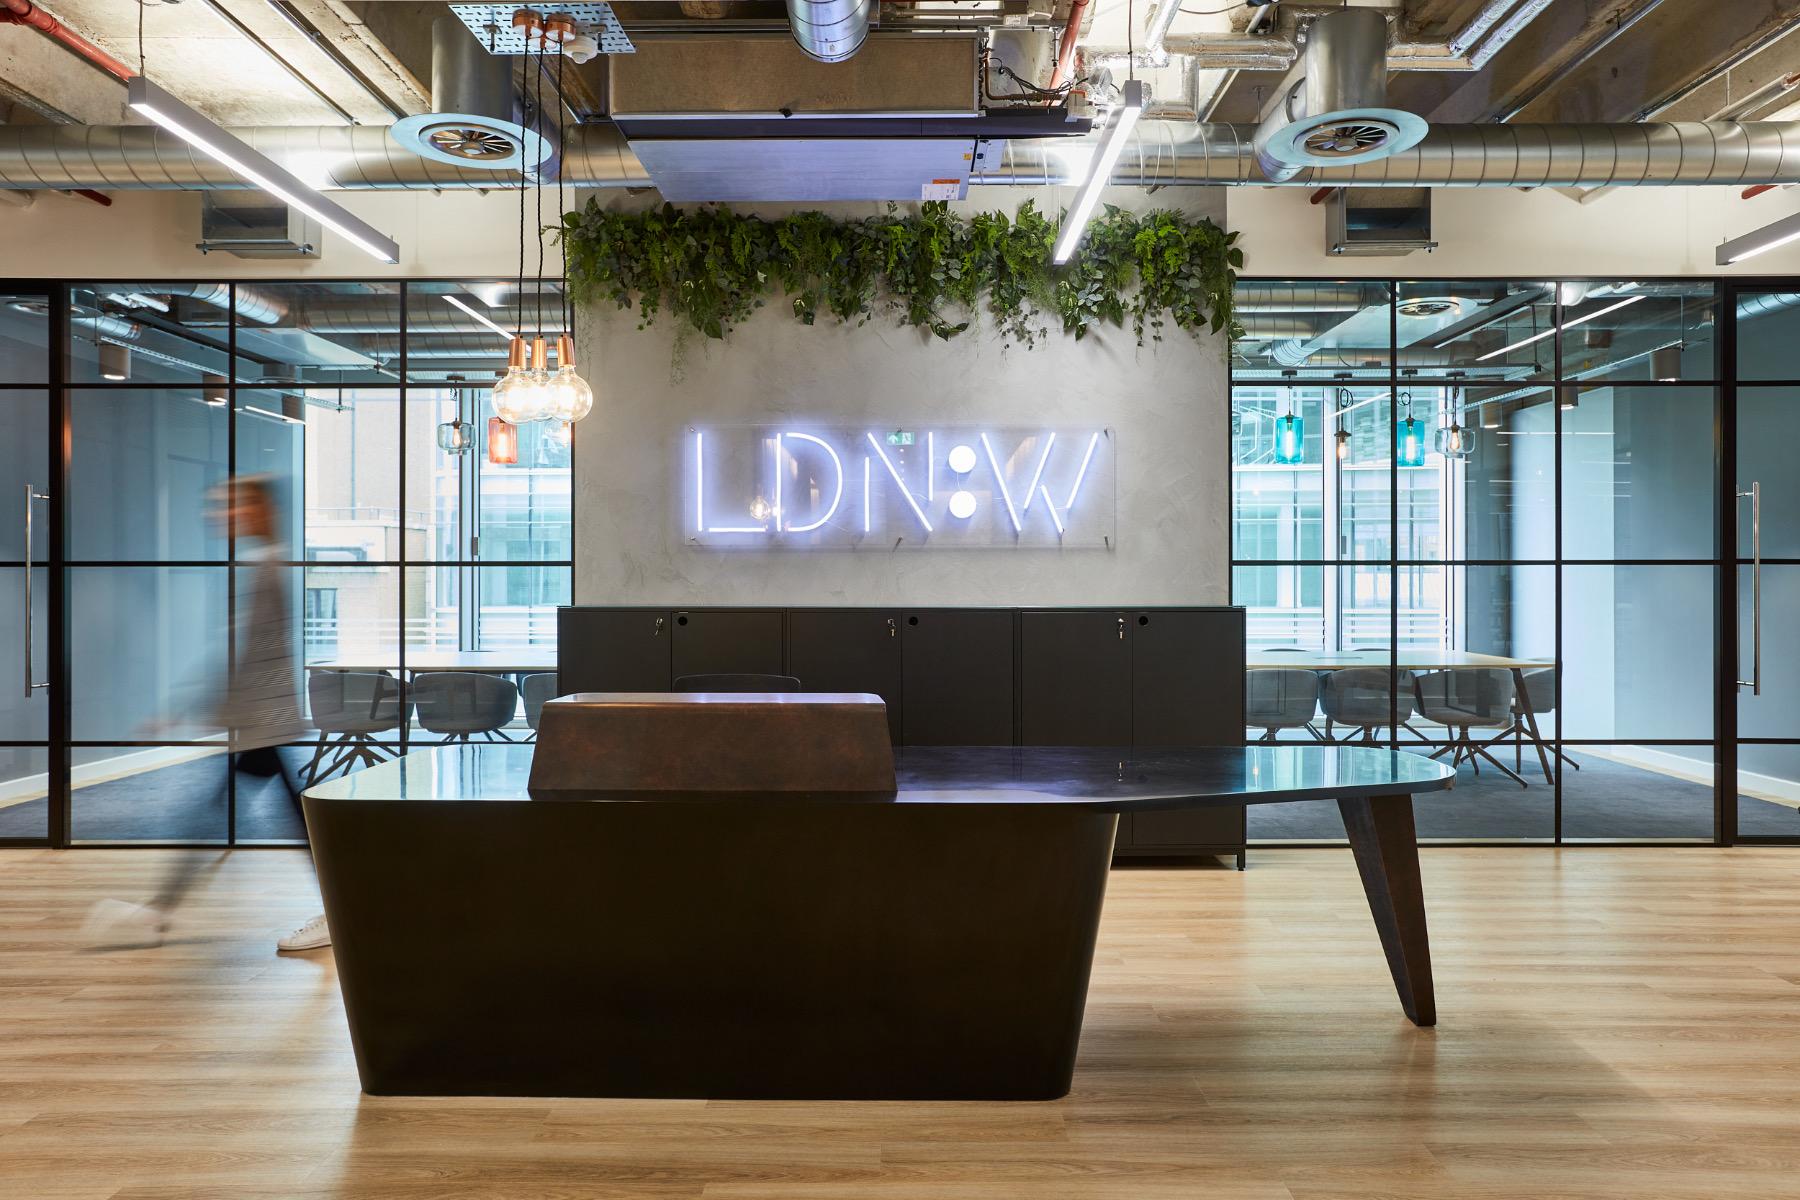 ldn-w-office-london-8